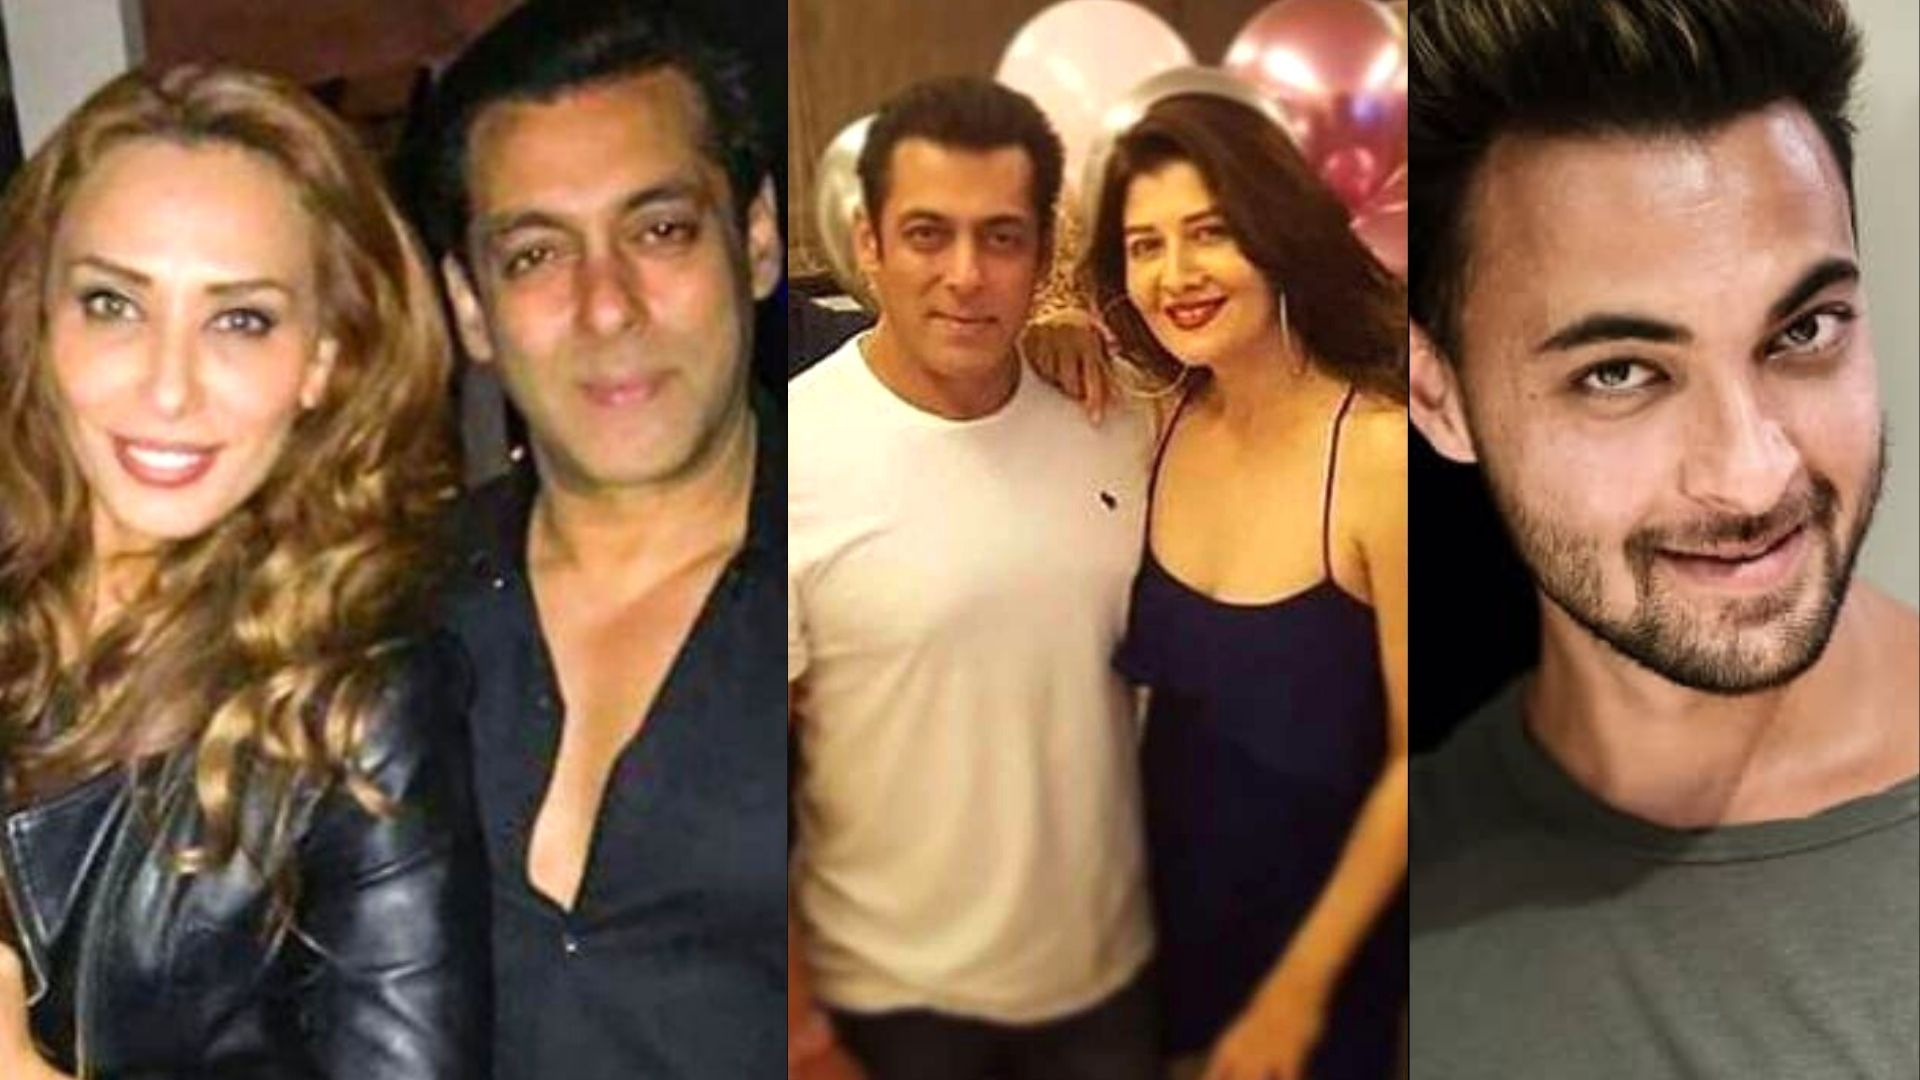 Salman Khan's Rumoured GF Iulia Vantur's Reaction After Bumping Into Superstar's Ex-GF Sangeeta Bijlani Will Leave You Stunned